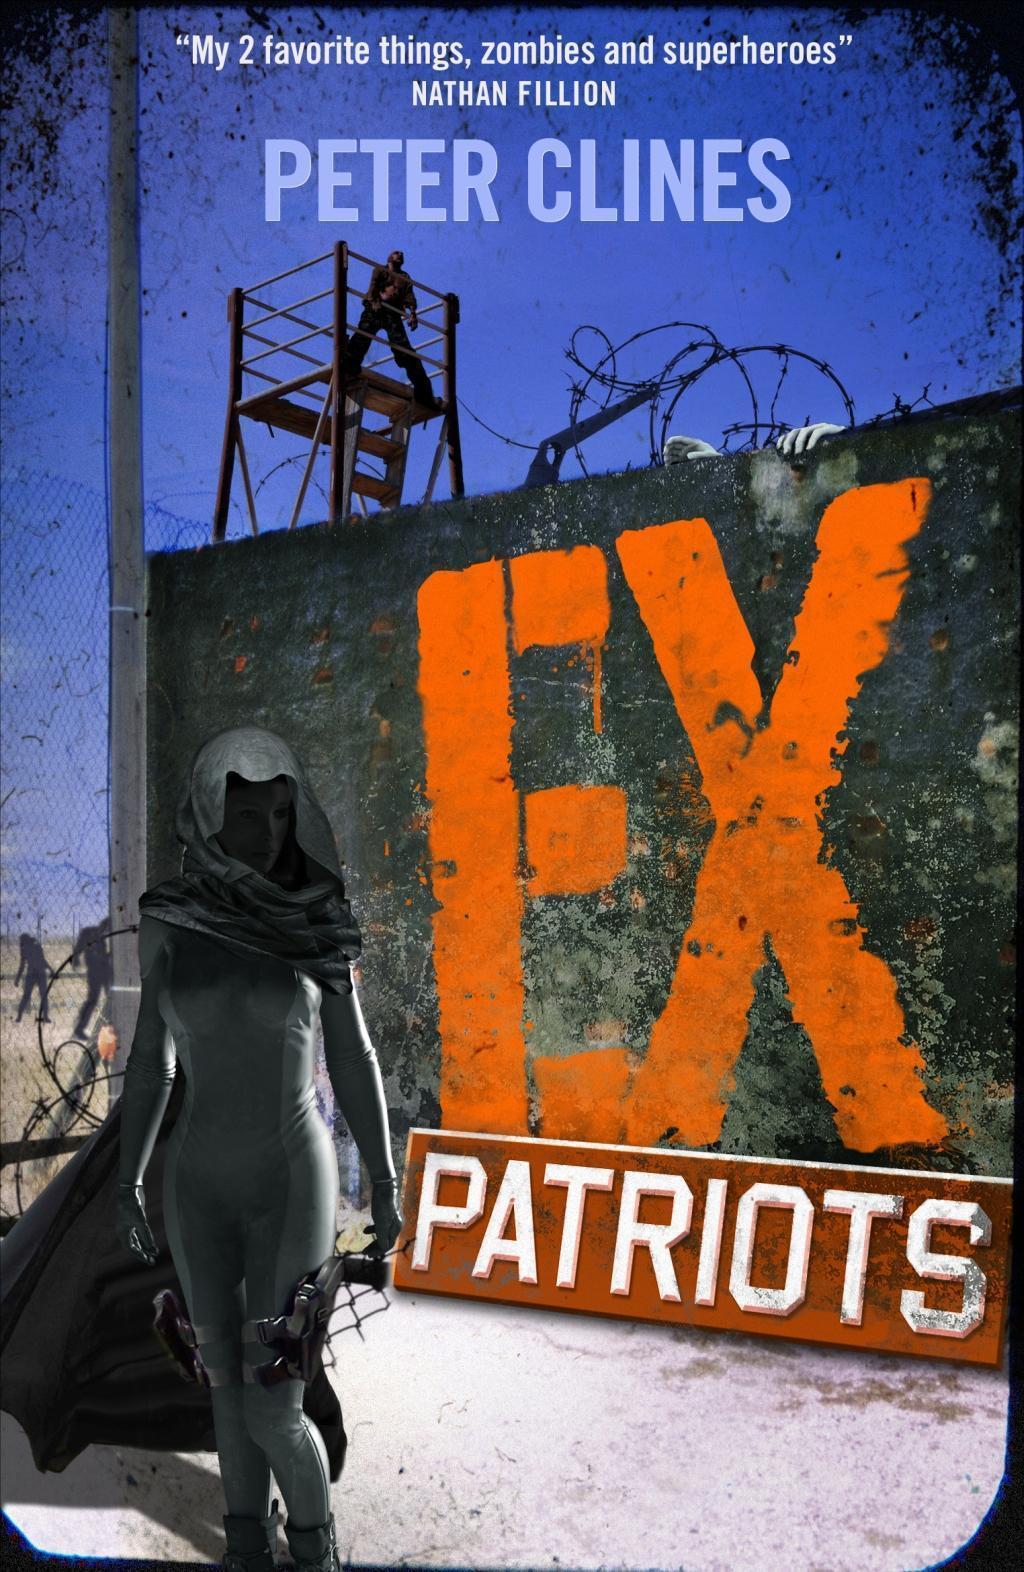 Ex-Patriots